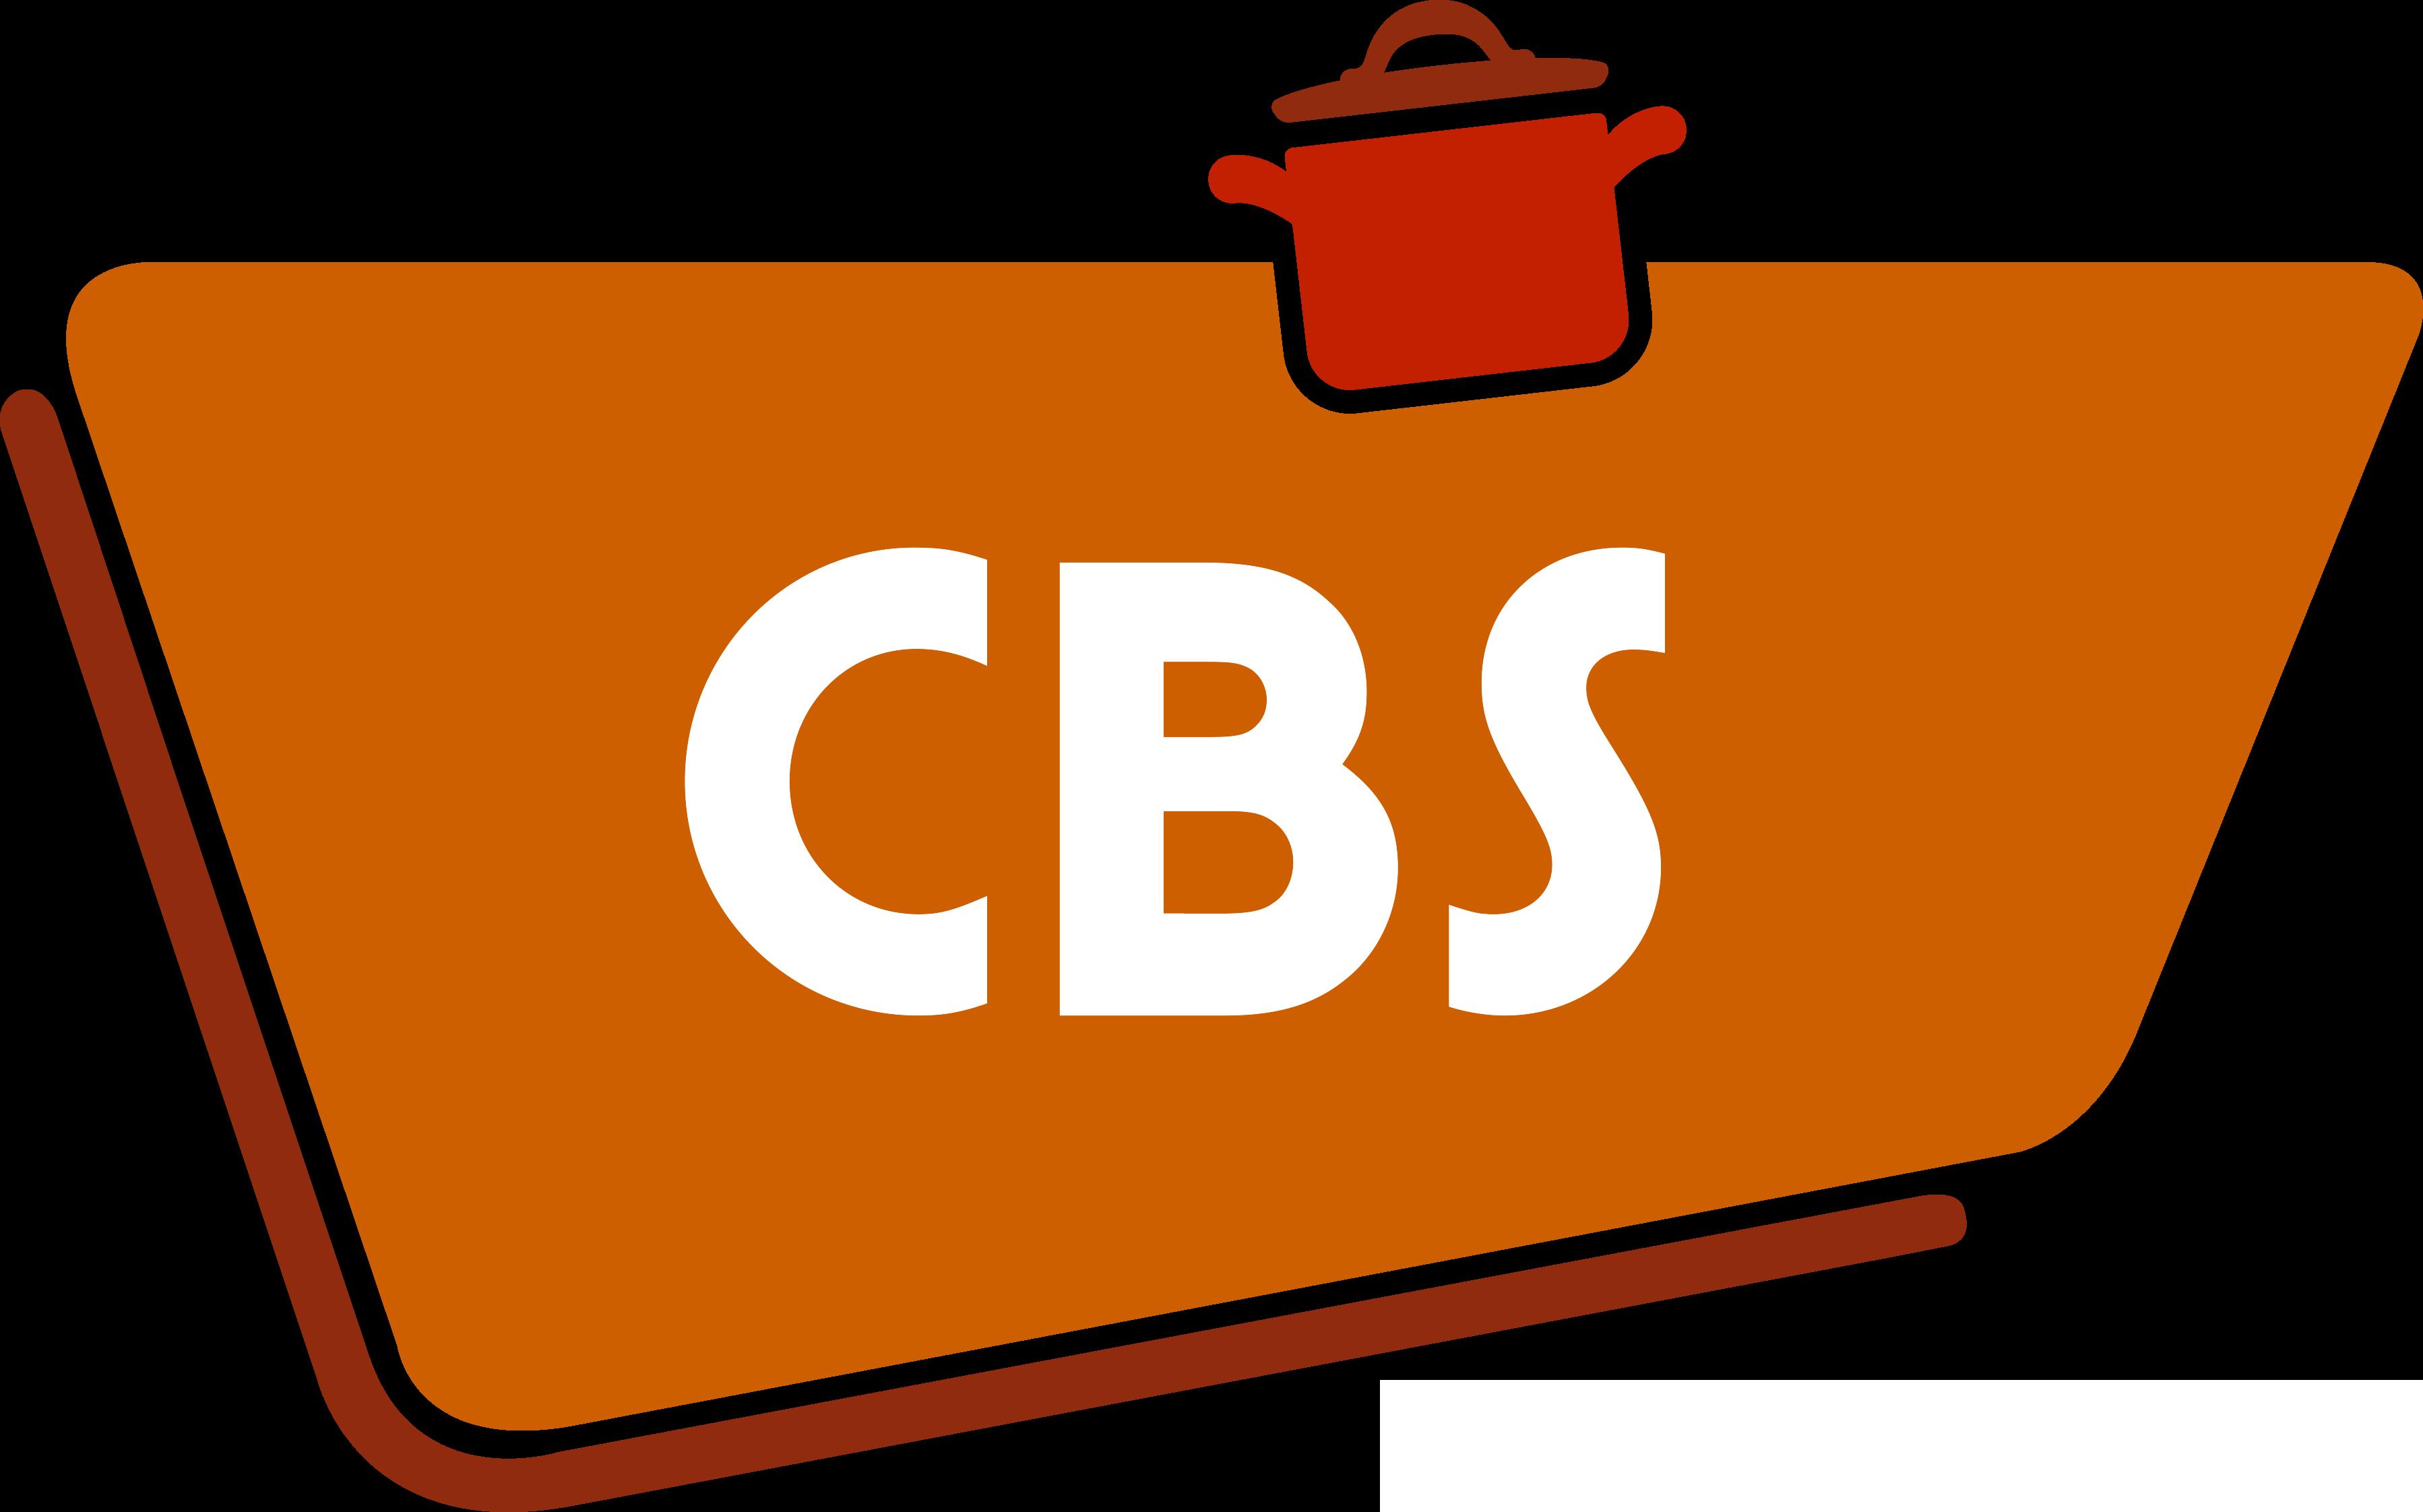 CBS_RVB